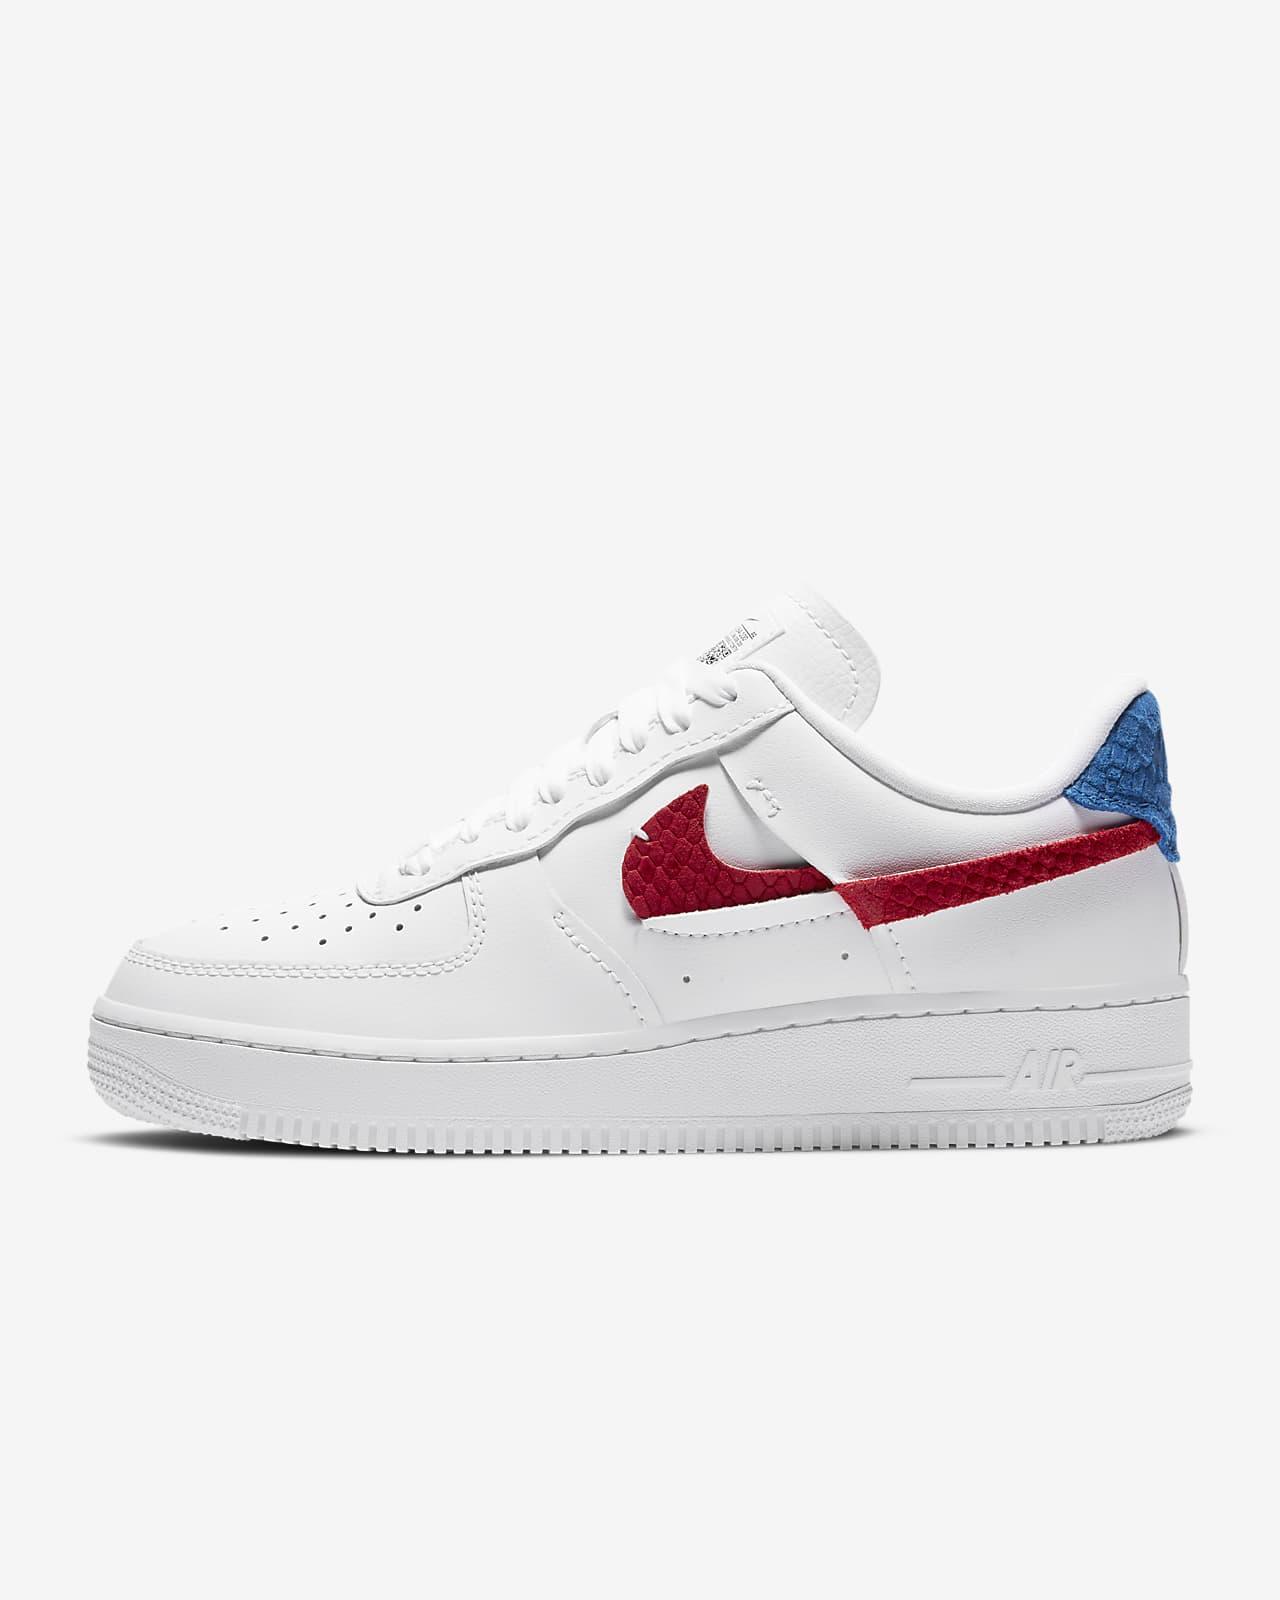 Nike Air Force 1 LXX női cipő